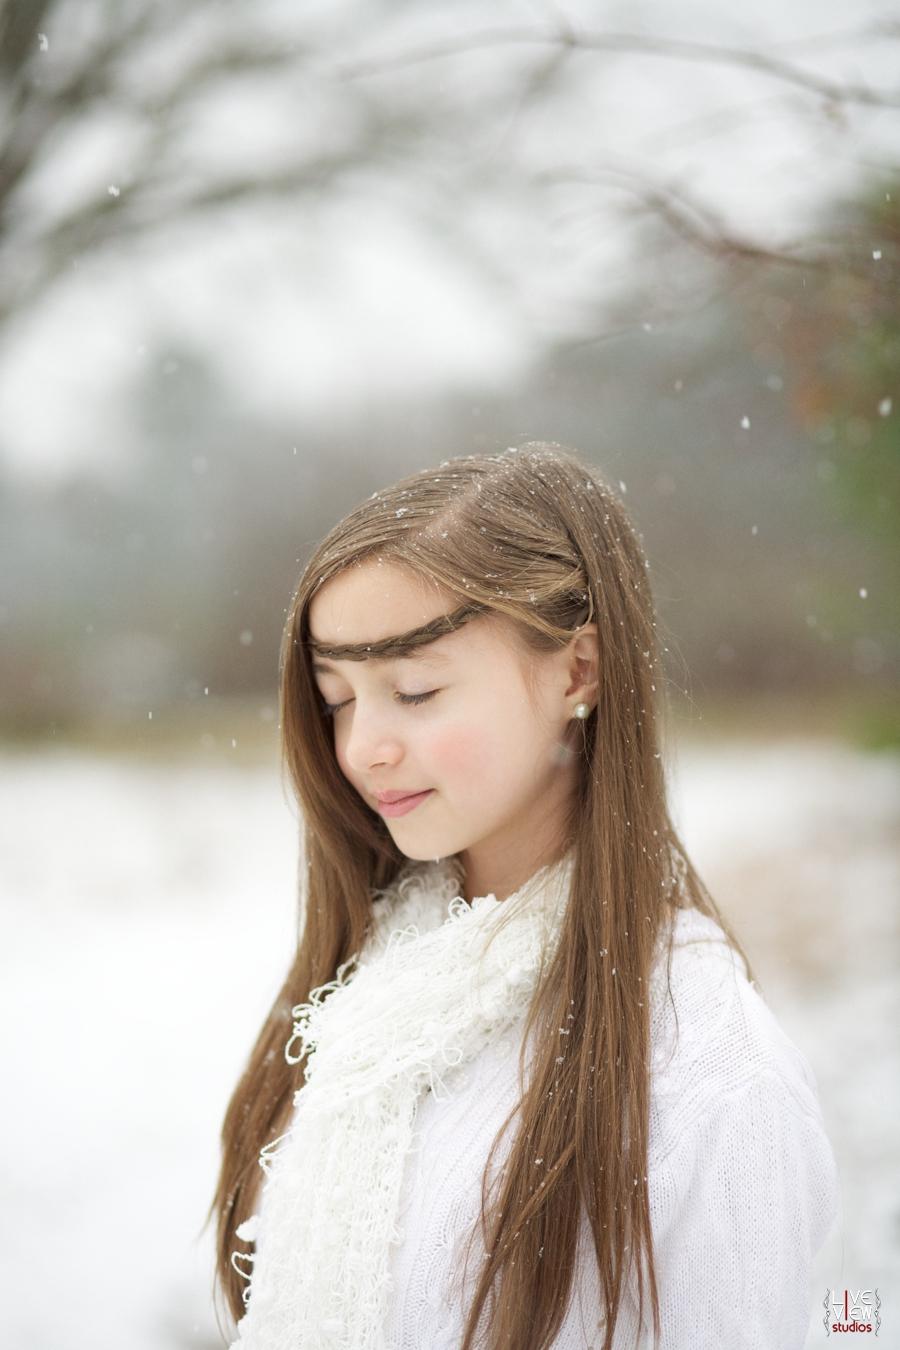 north carolina snow photography, ethereal children's portrait photographers